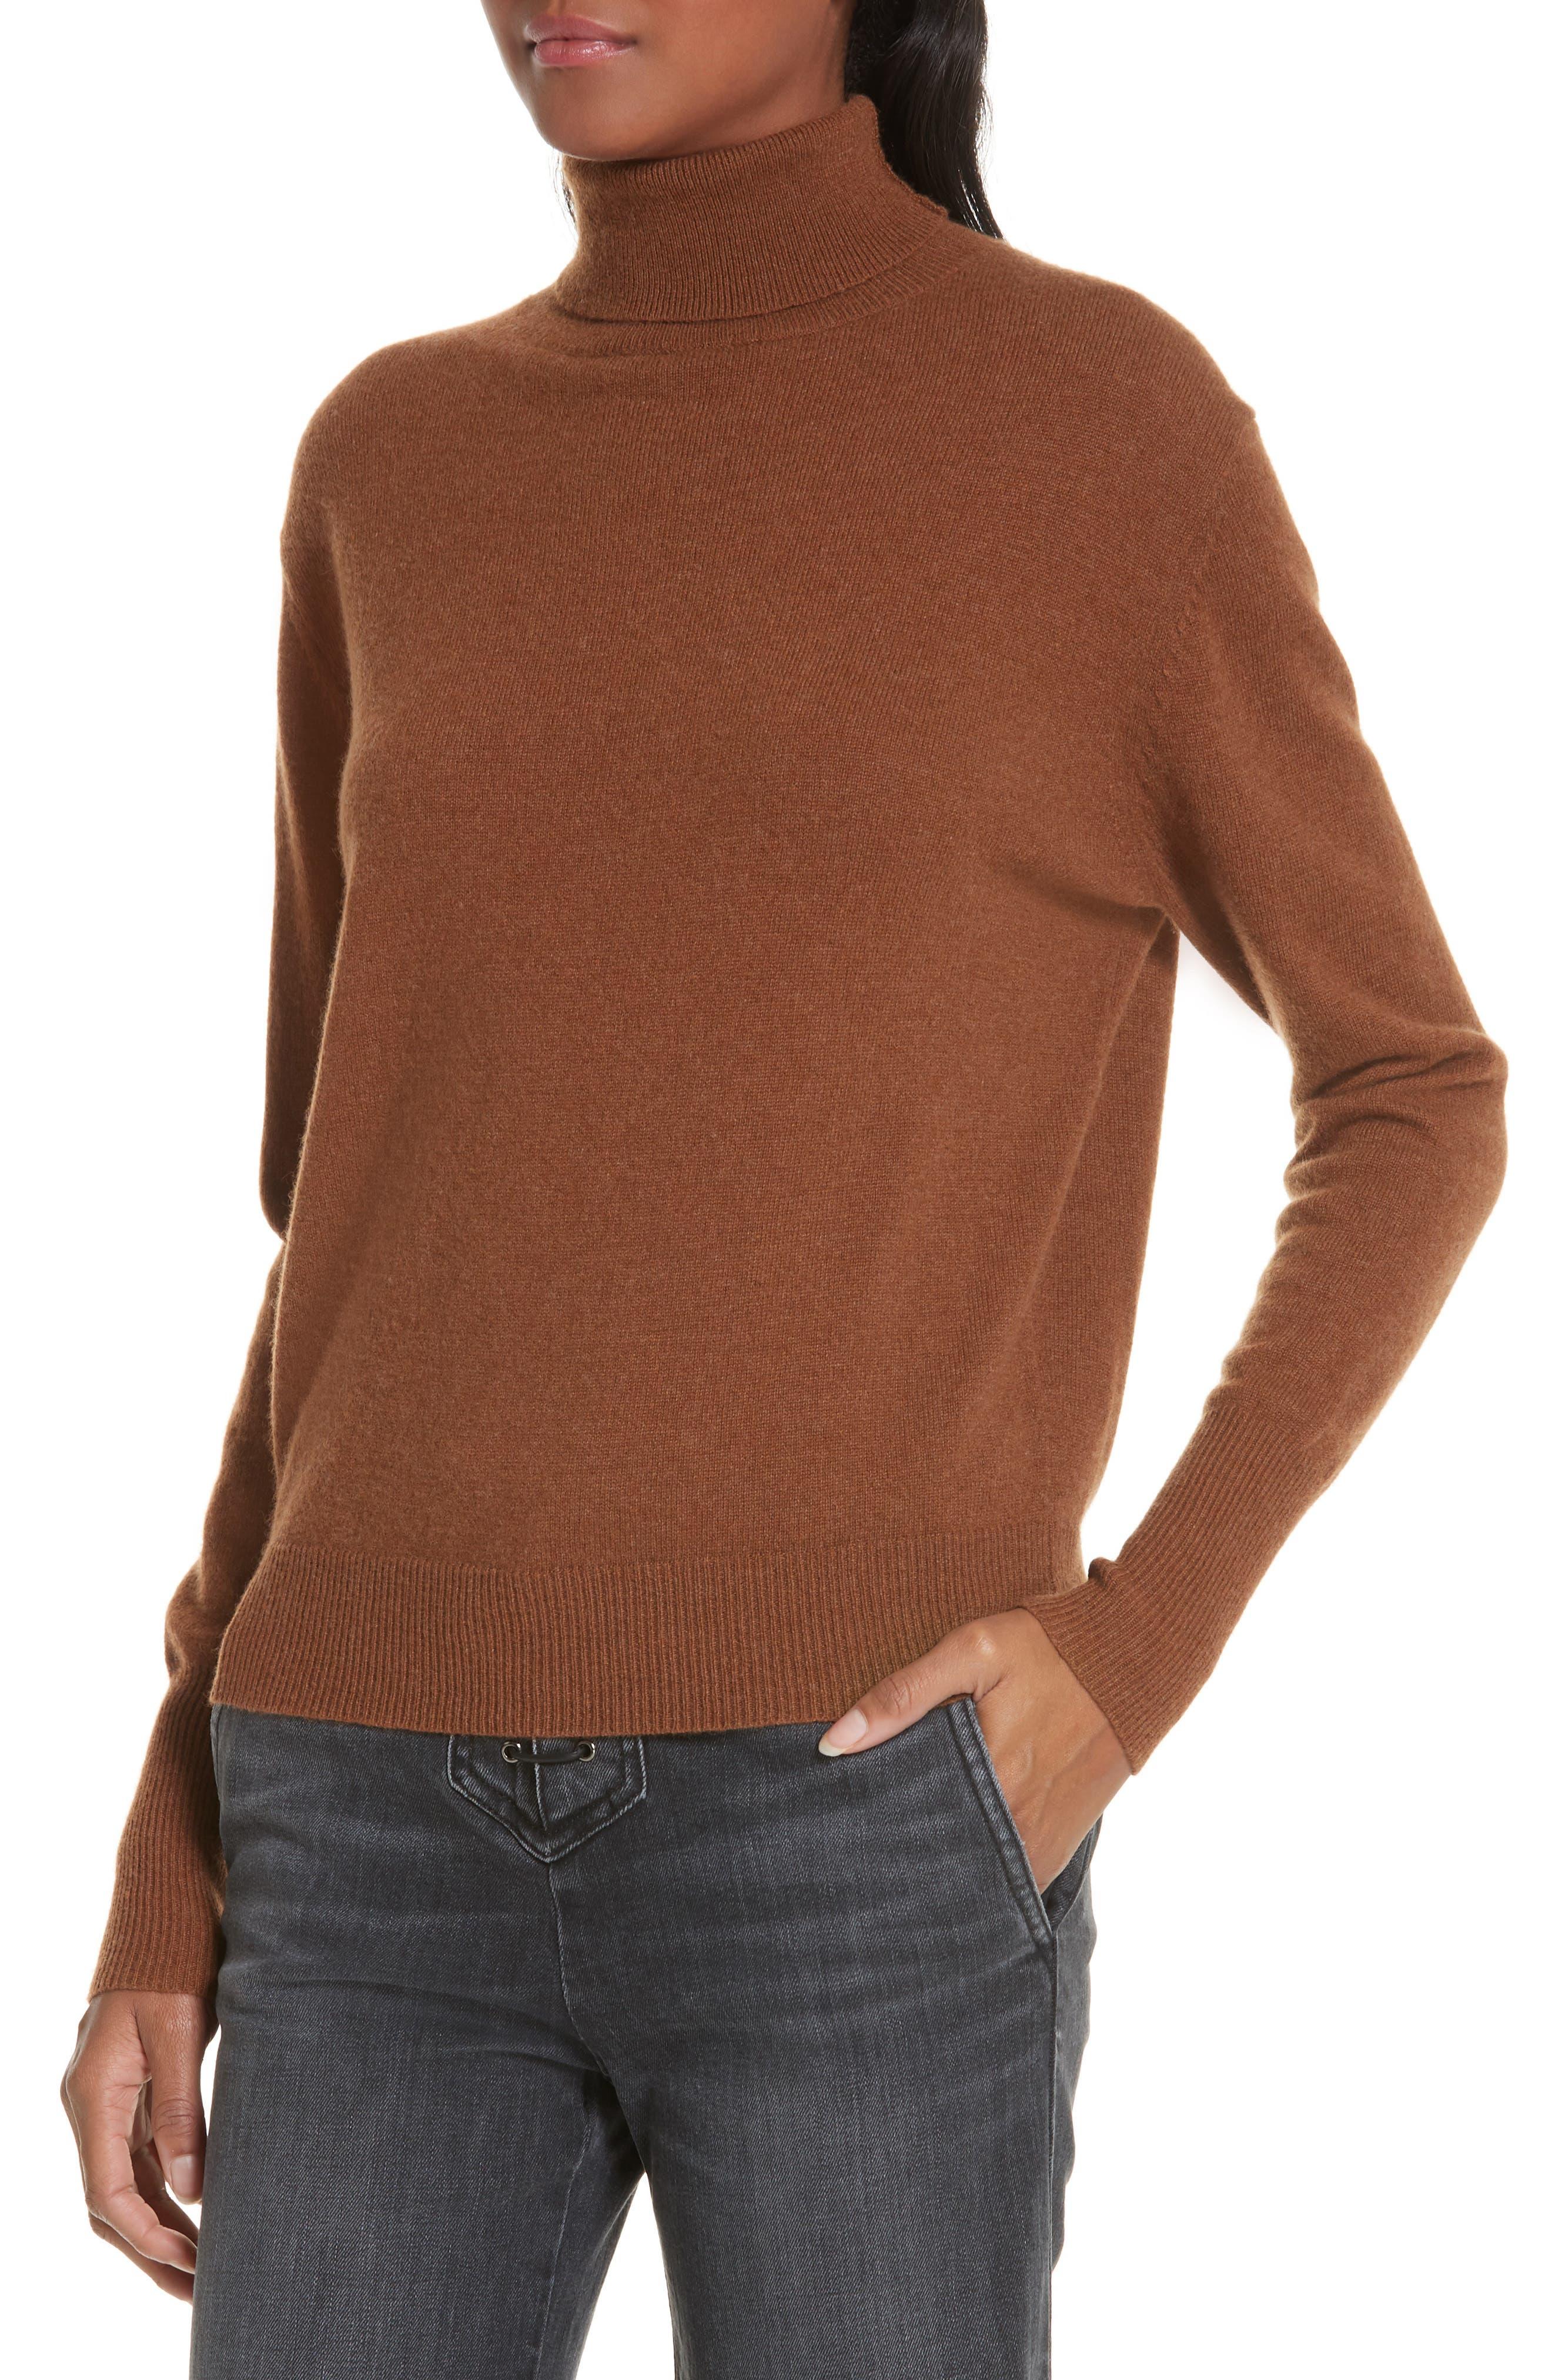 NILI LOTAN, Ralphie Cashmere Turtleneck Sweater, Alternate thumbnail 4, color, COGNAC